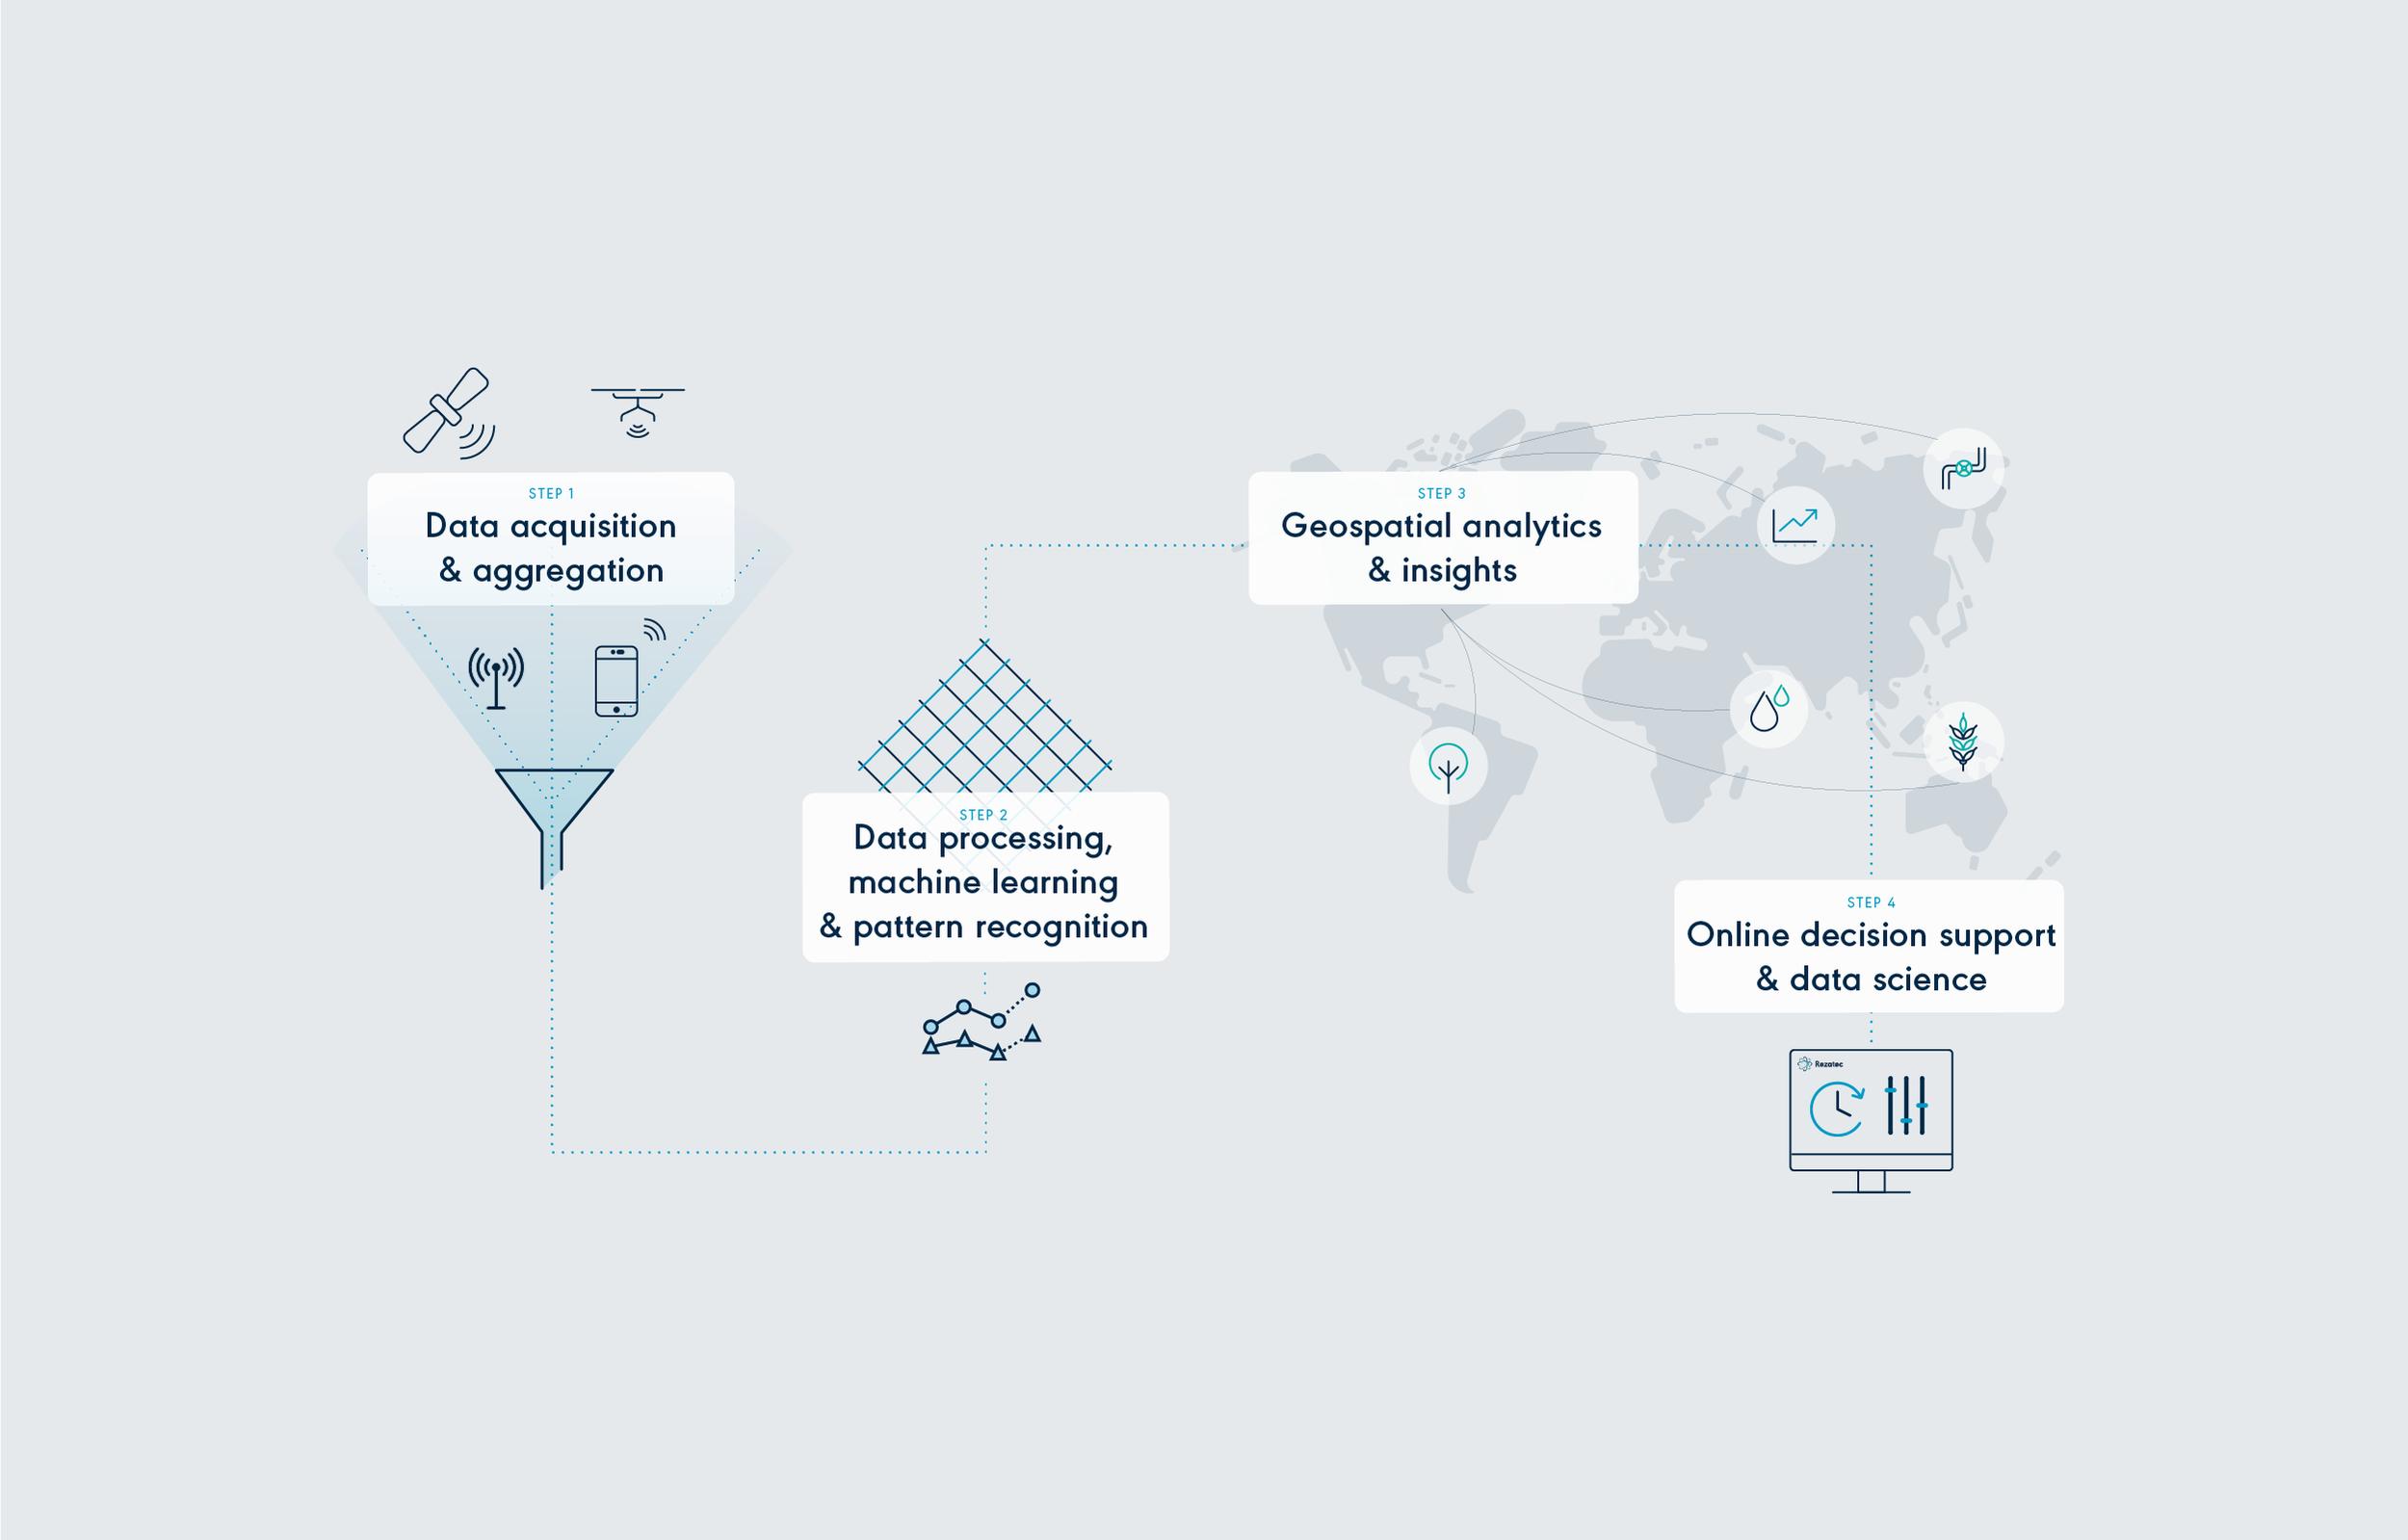 Rezatec_Analyzing_Earths_Data_Services_Diagram_Tunbridge_Studio.png